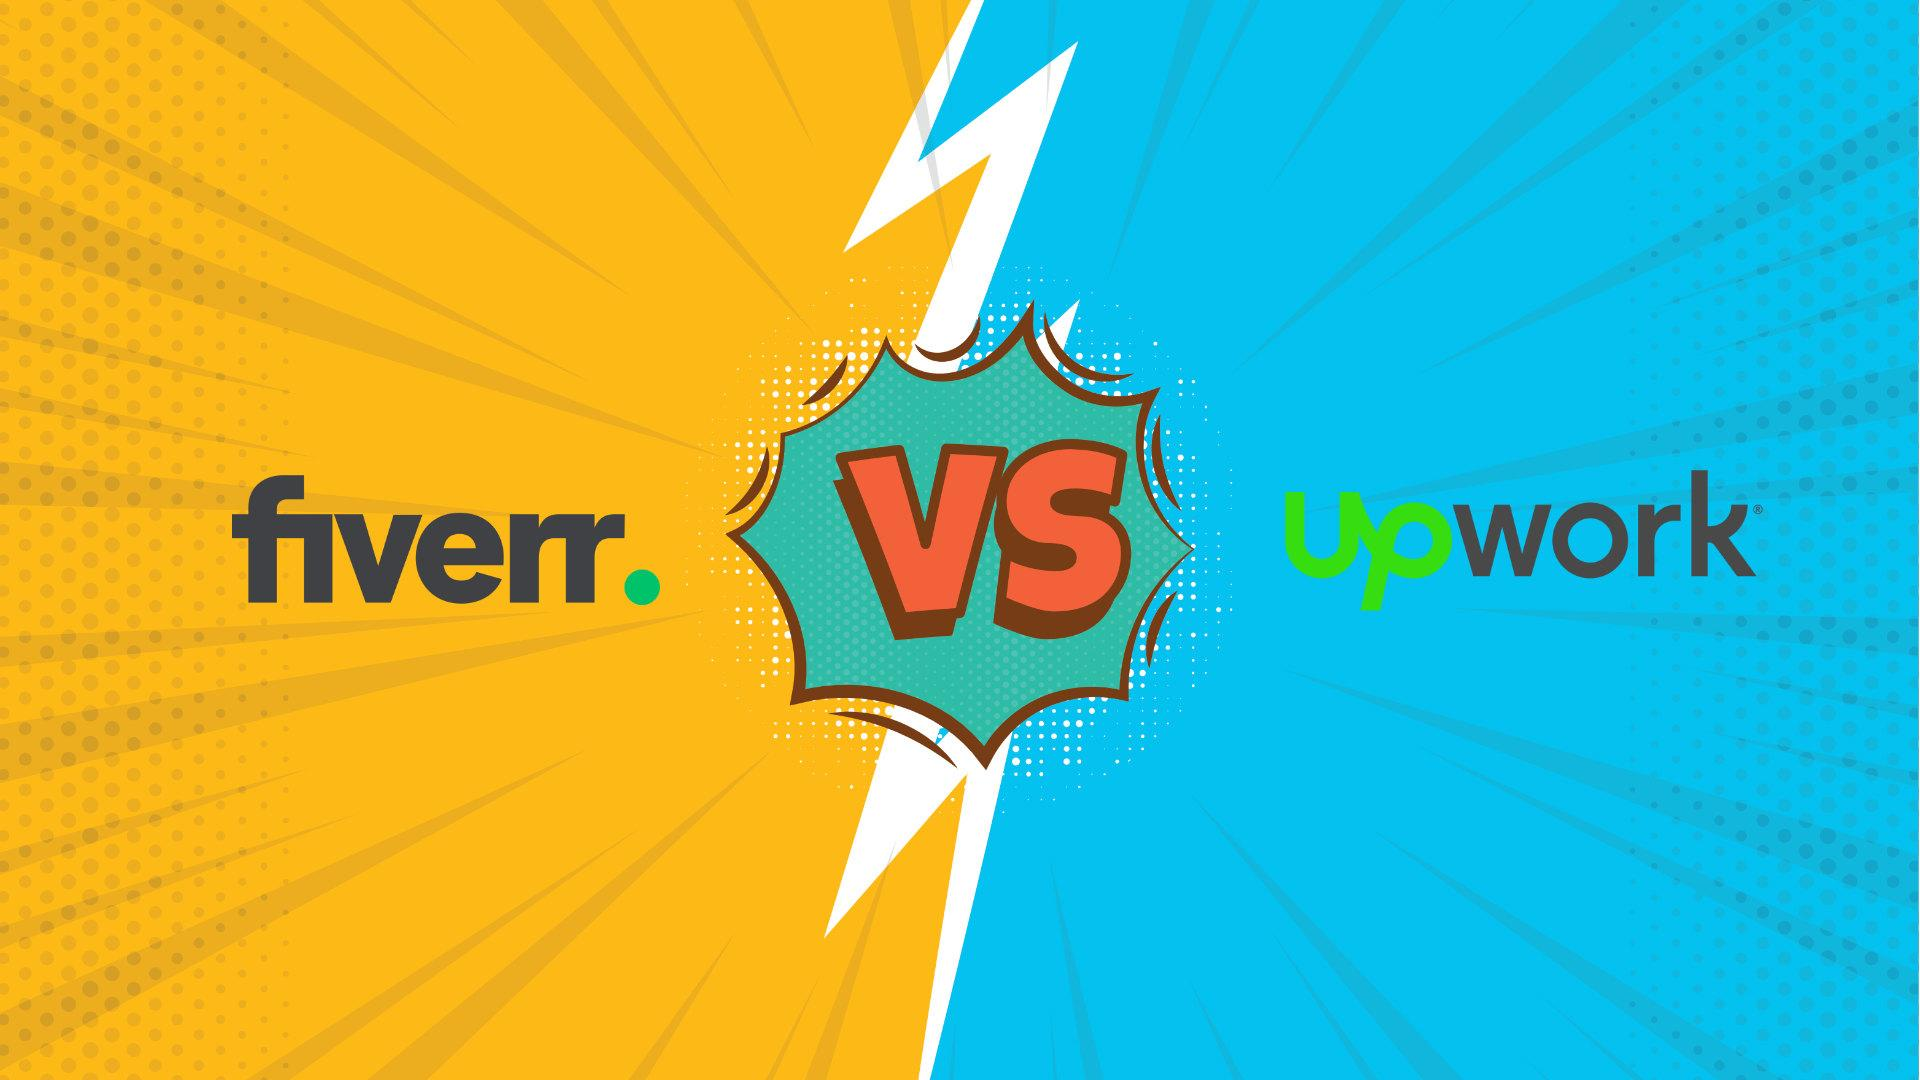 Fiverr vs Upwork: Client and Freelancer POV